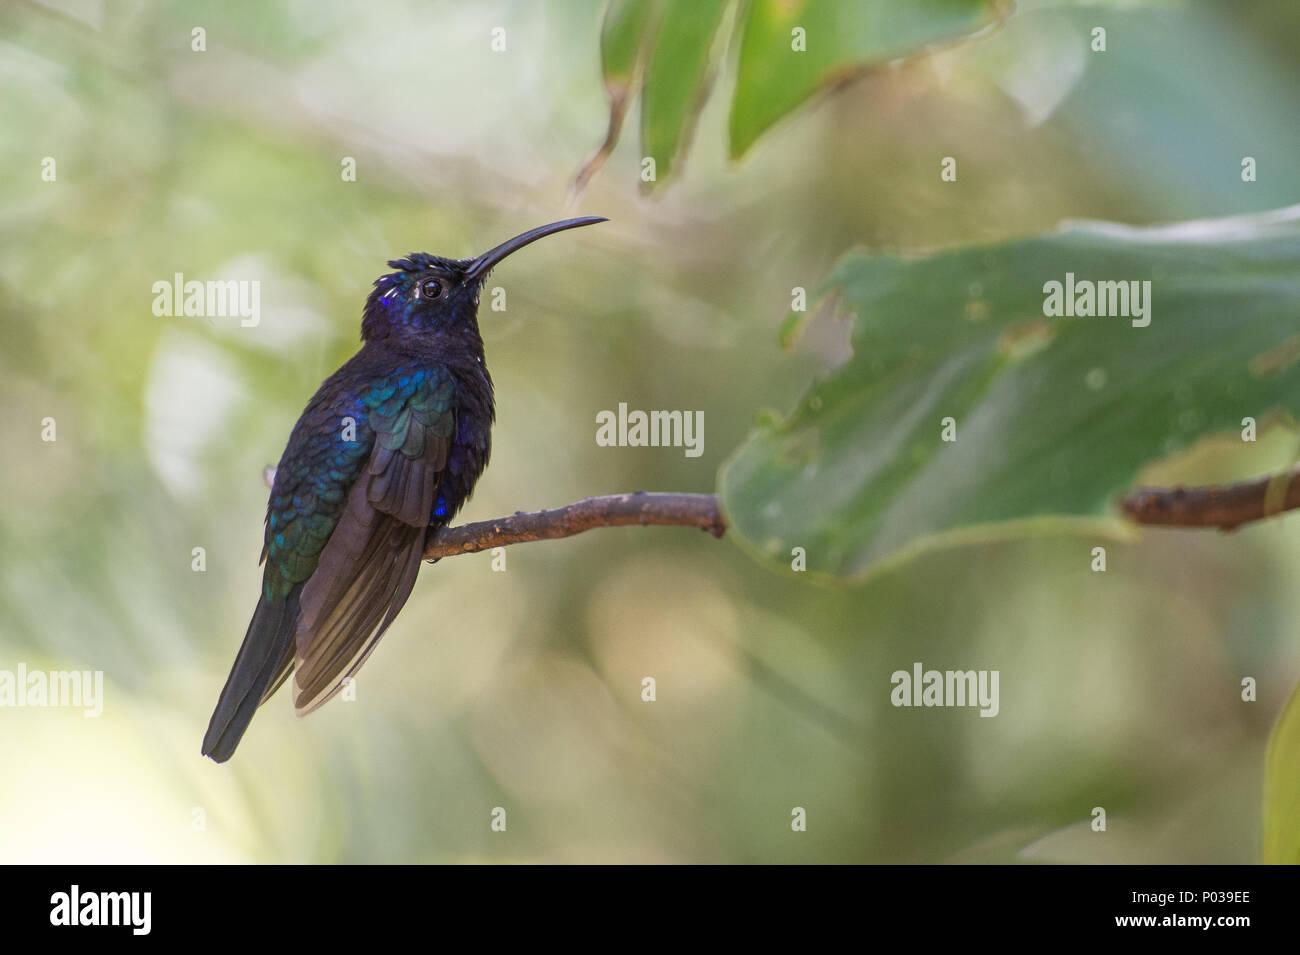 Violet sabrewing, Campylopterus hemileucurus, Trochilidae, Monteverde Cloud Forest Reserve, Costa Rica, hummingbird Stock Photo